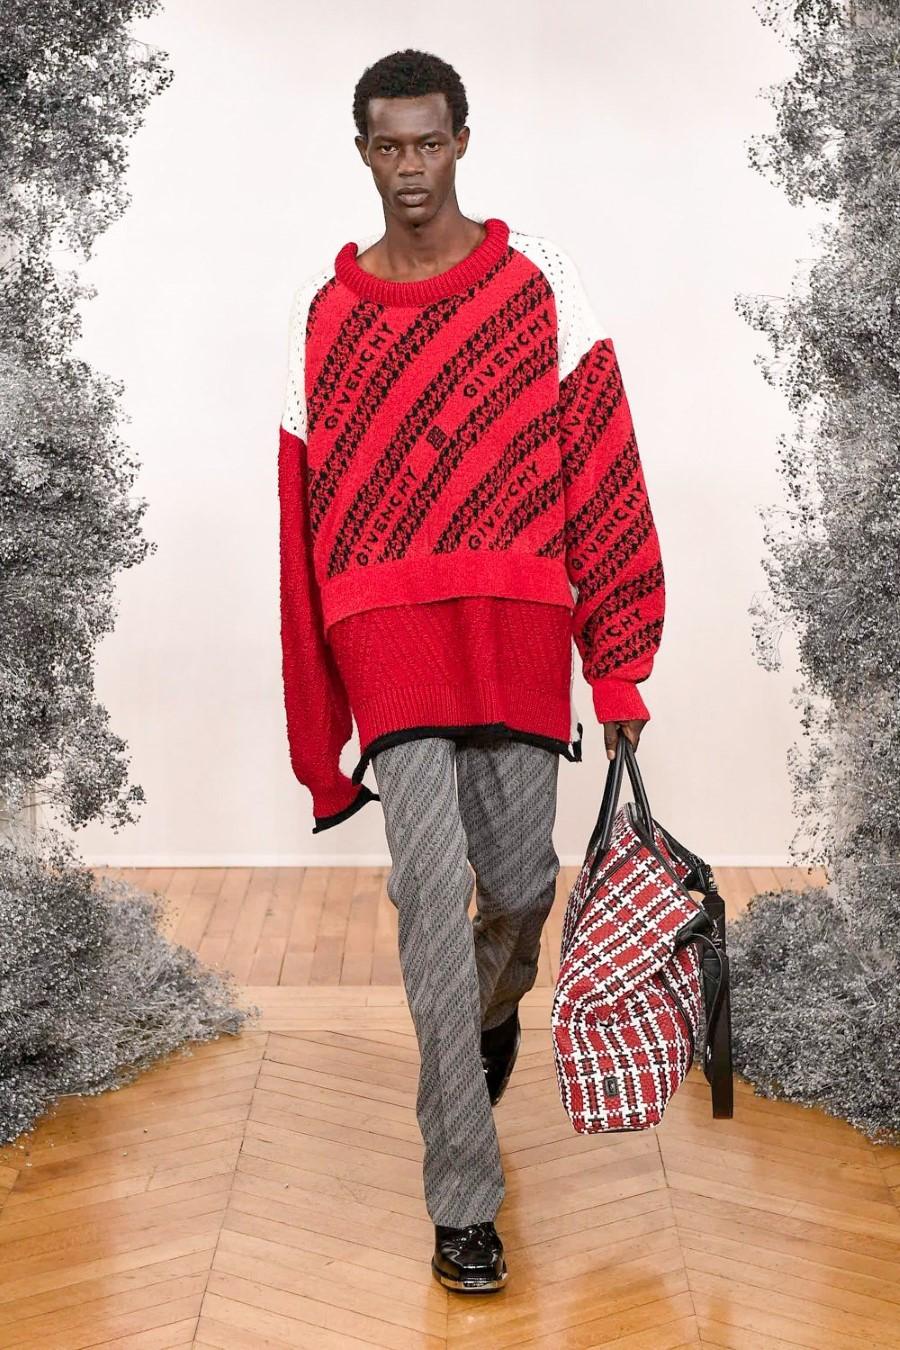 Givenchy - Fall Winter 2020 - Paris Fashion Week Men's